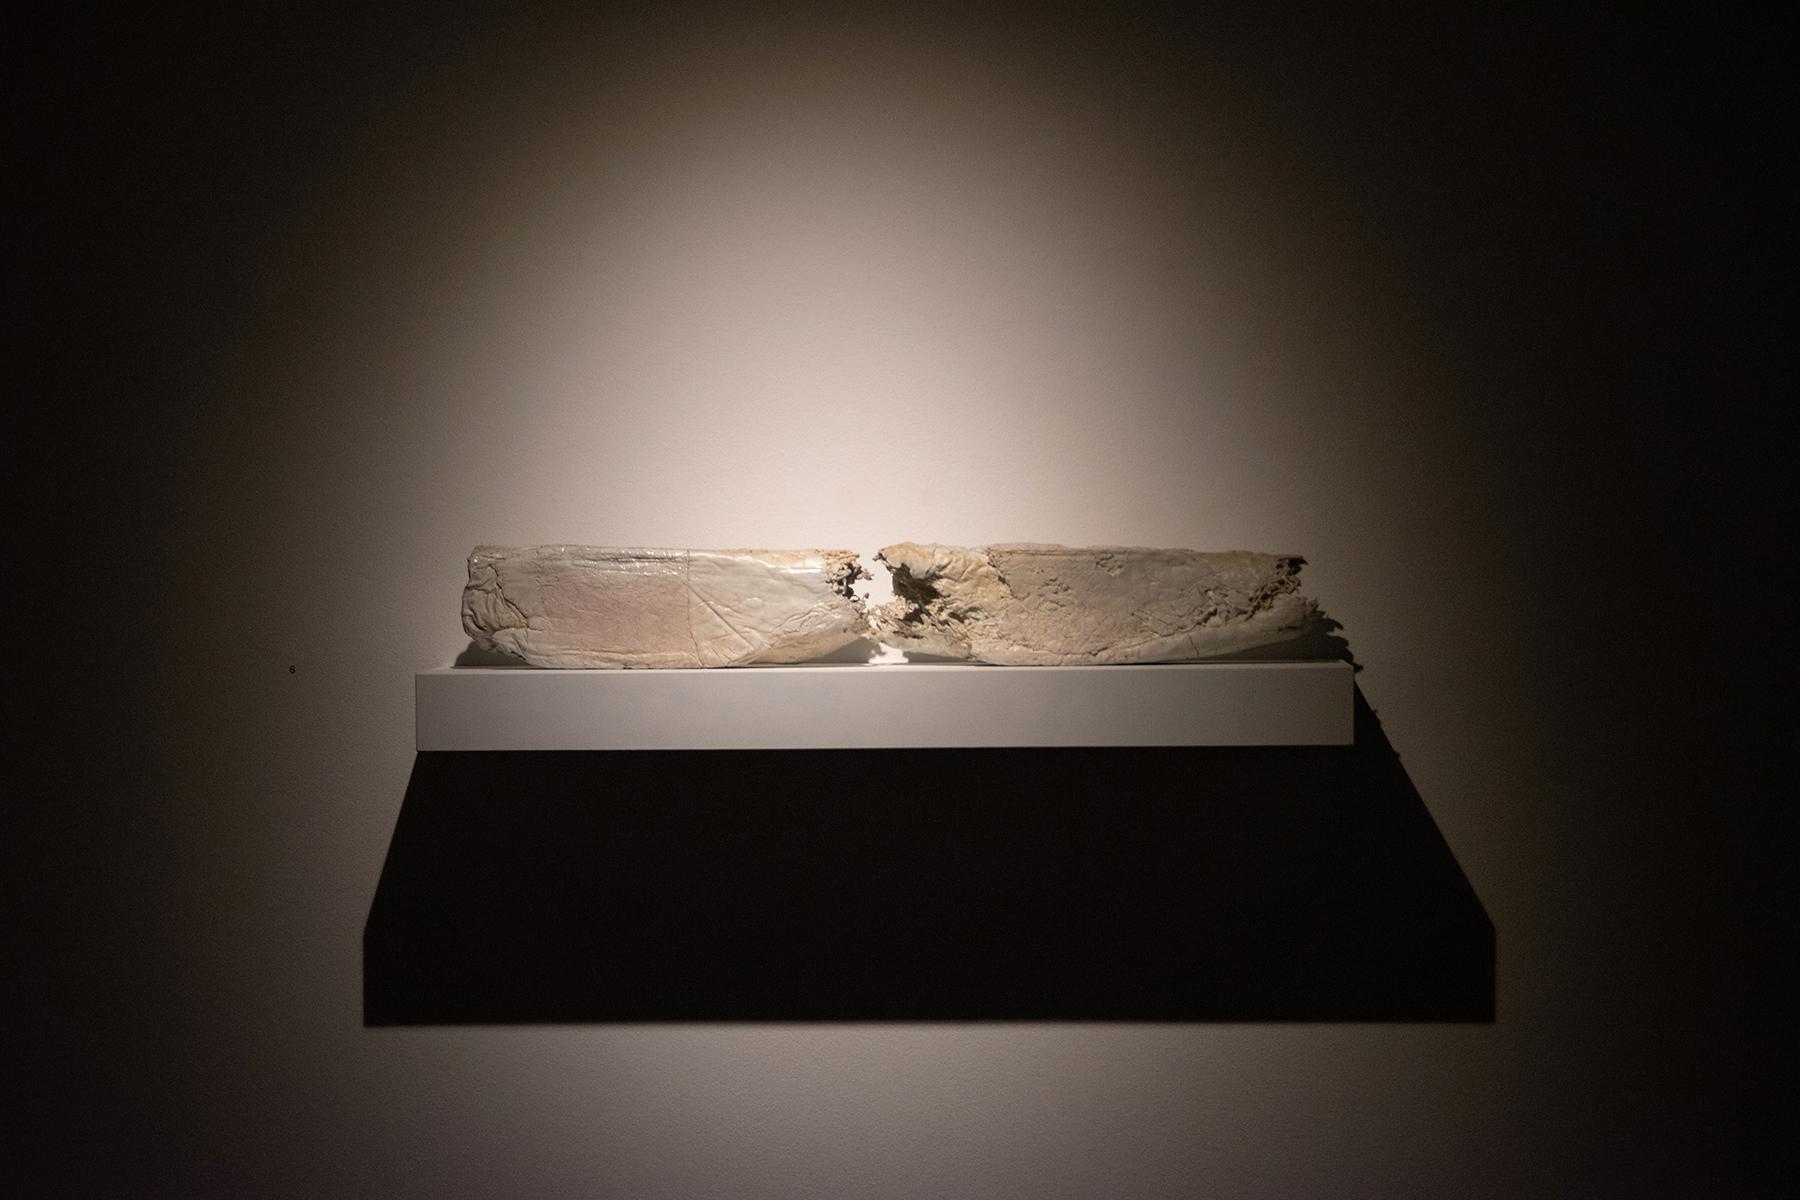 Visiting Artist Brad Taylor with Ceramics students at Utah Museum of Contemporary Art, September 2020